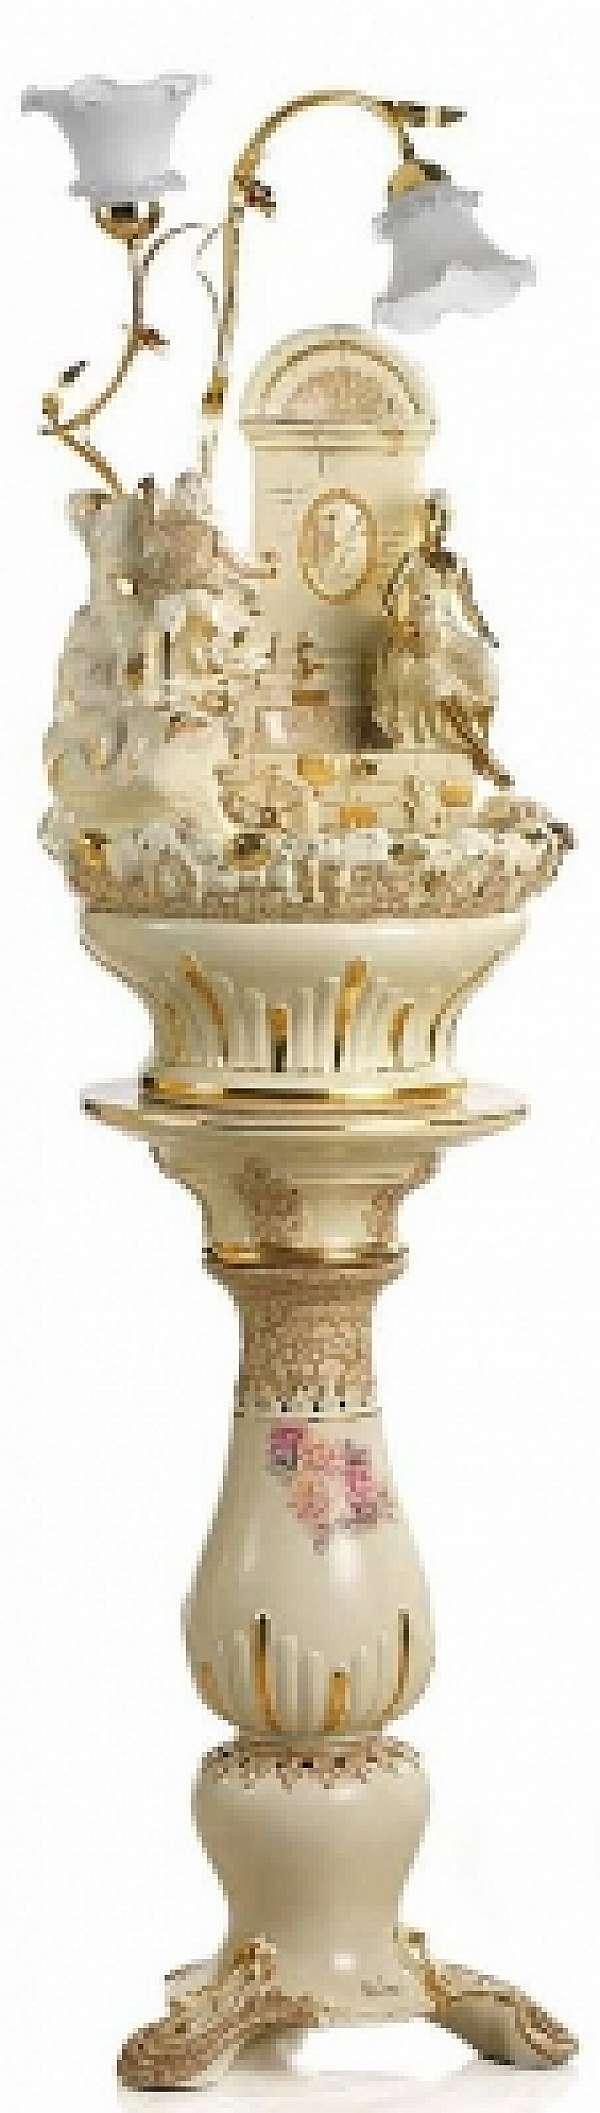 Напольная лампа LORENZON (F.LLI LORENZON) L.721/AVOLF ARTE E CERAMICA